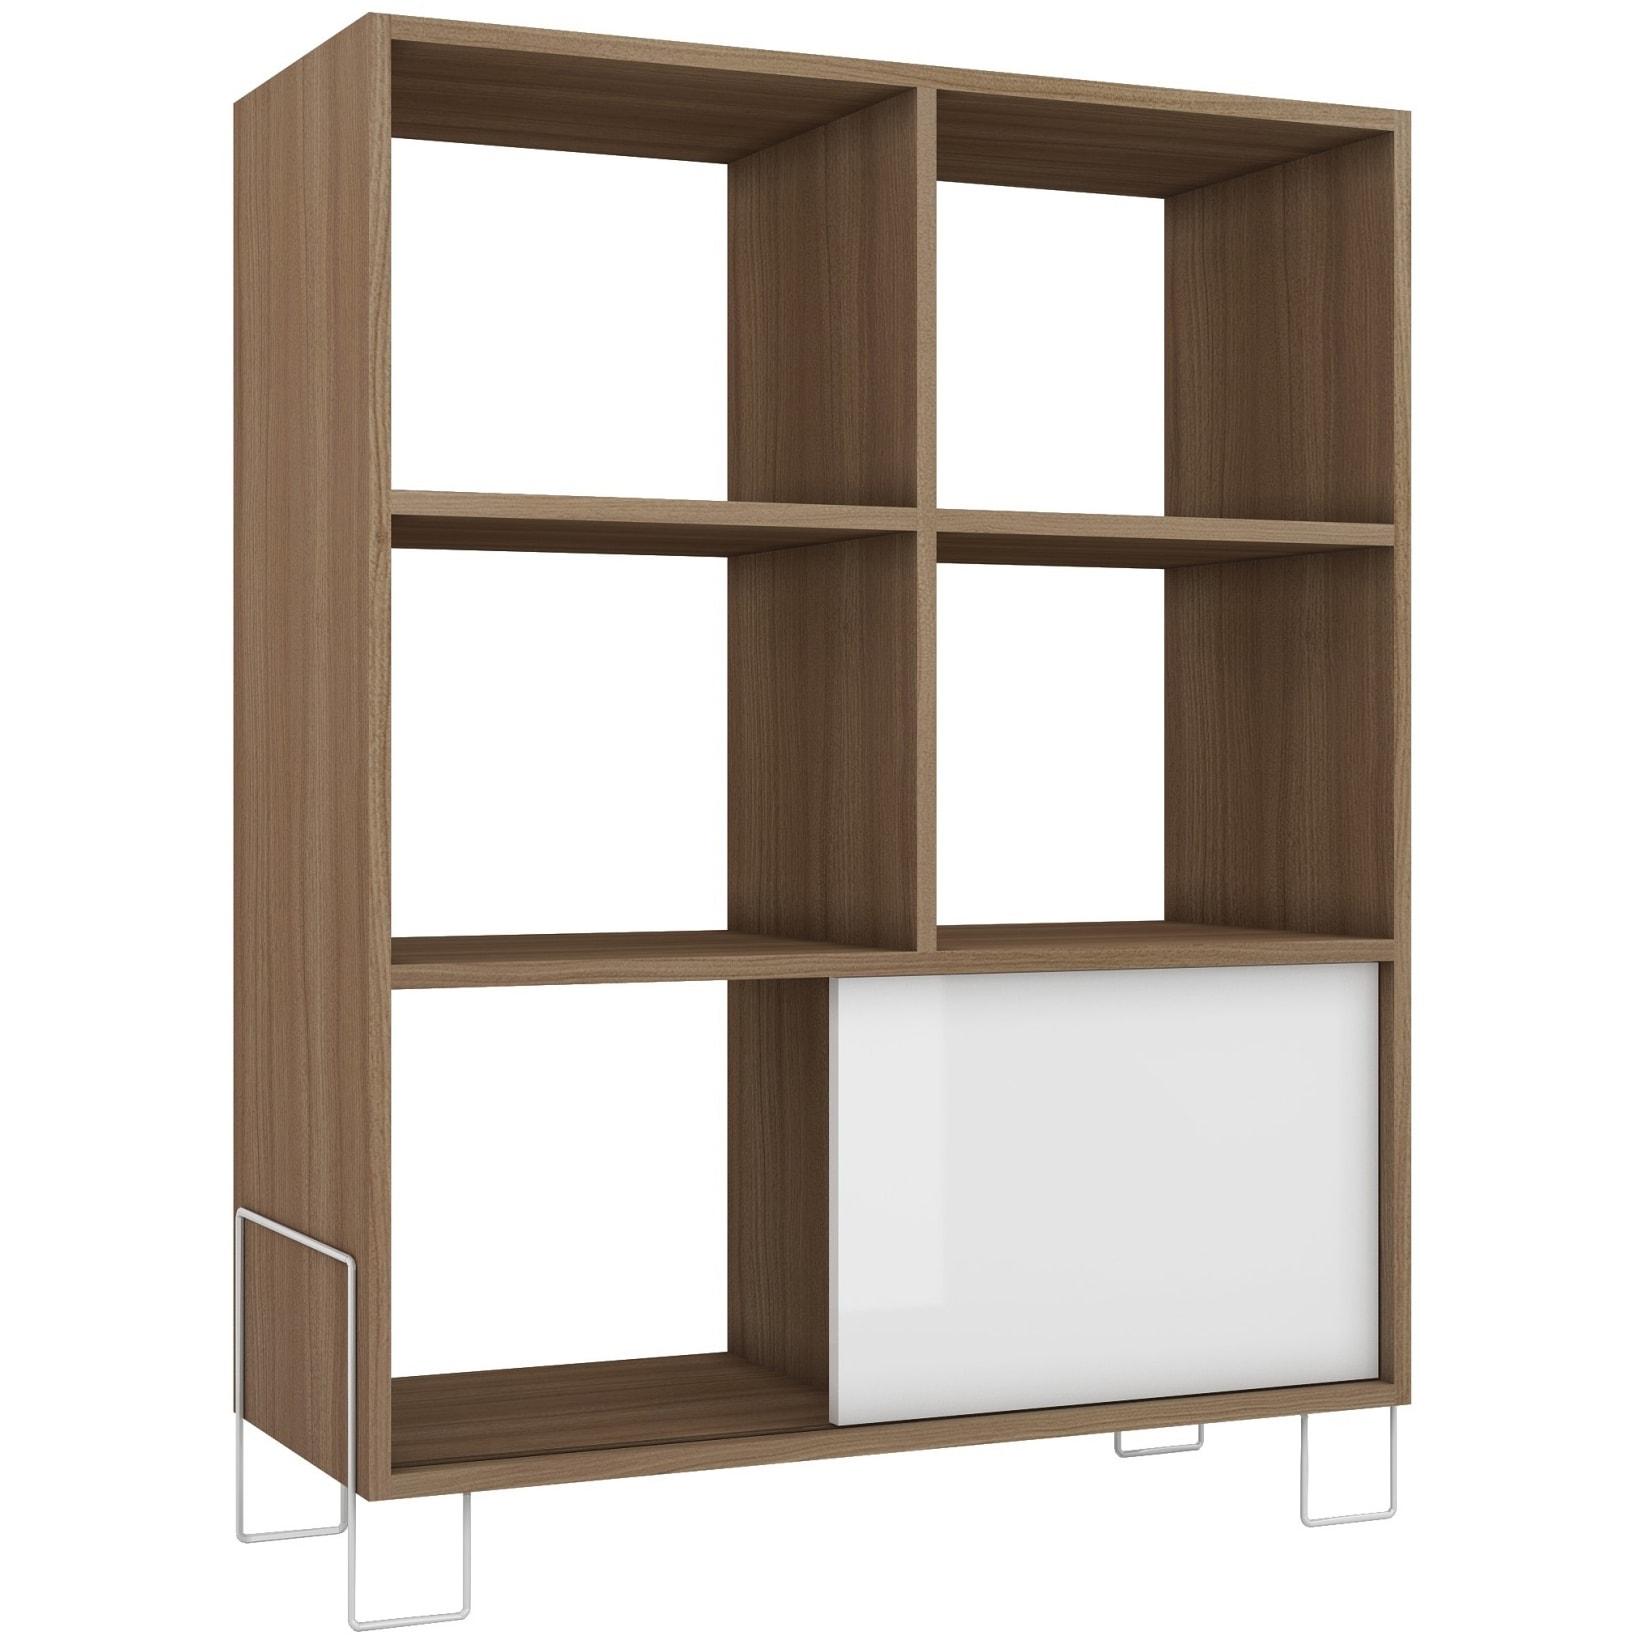 office display home shelves wooden s shape storage furniture shelf homcom bookcase decor